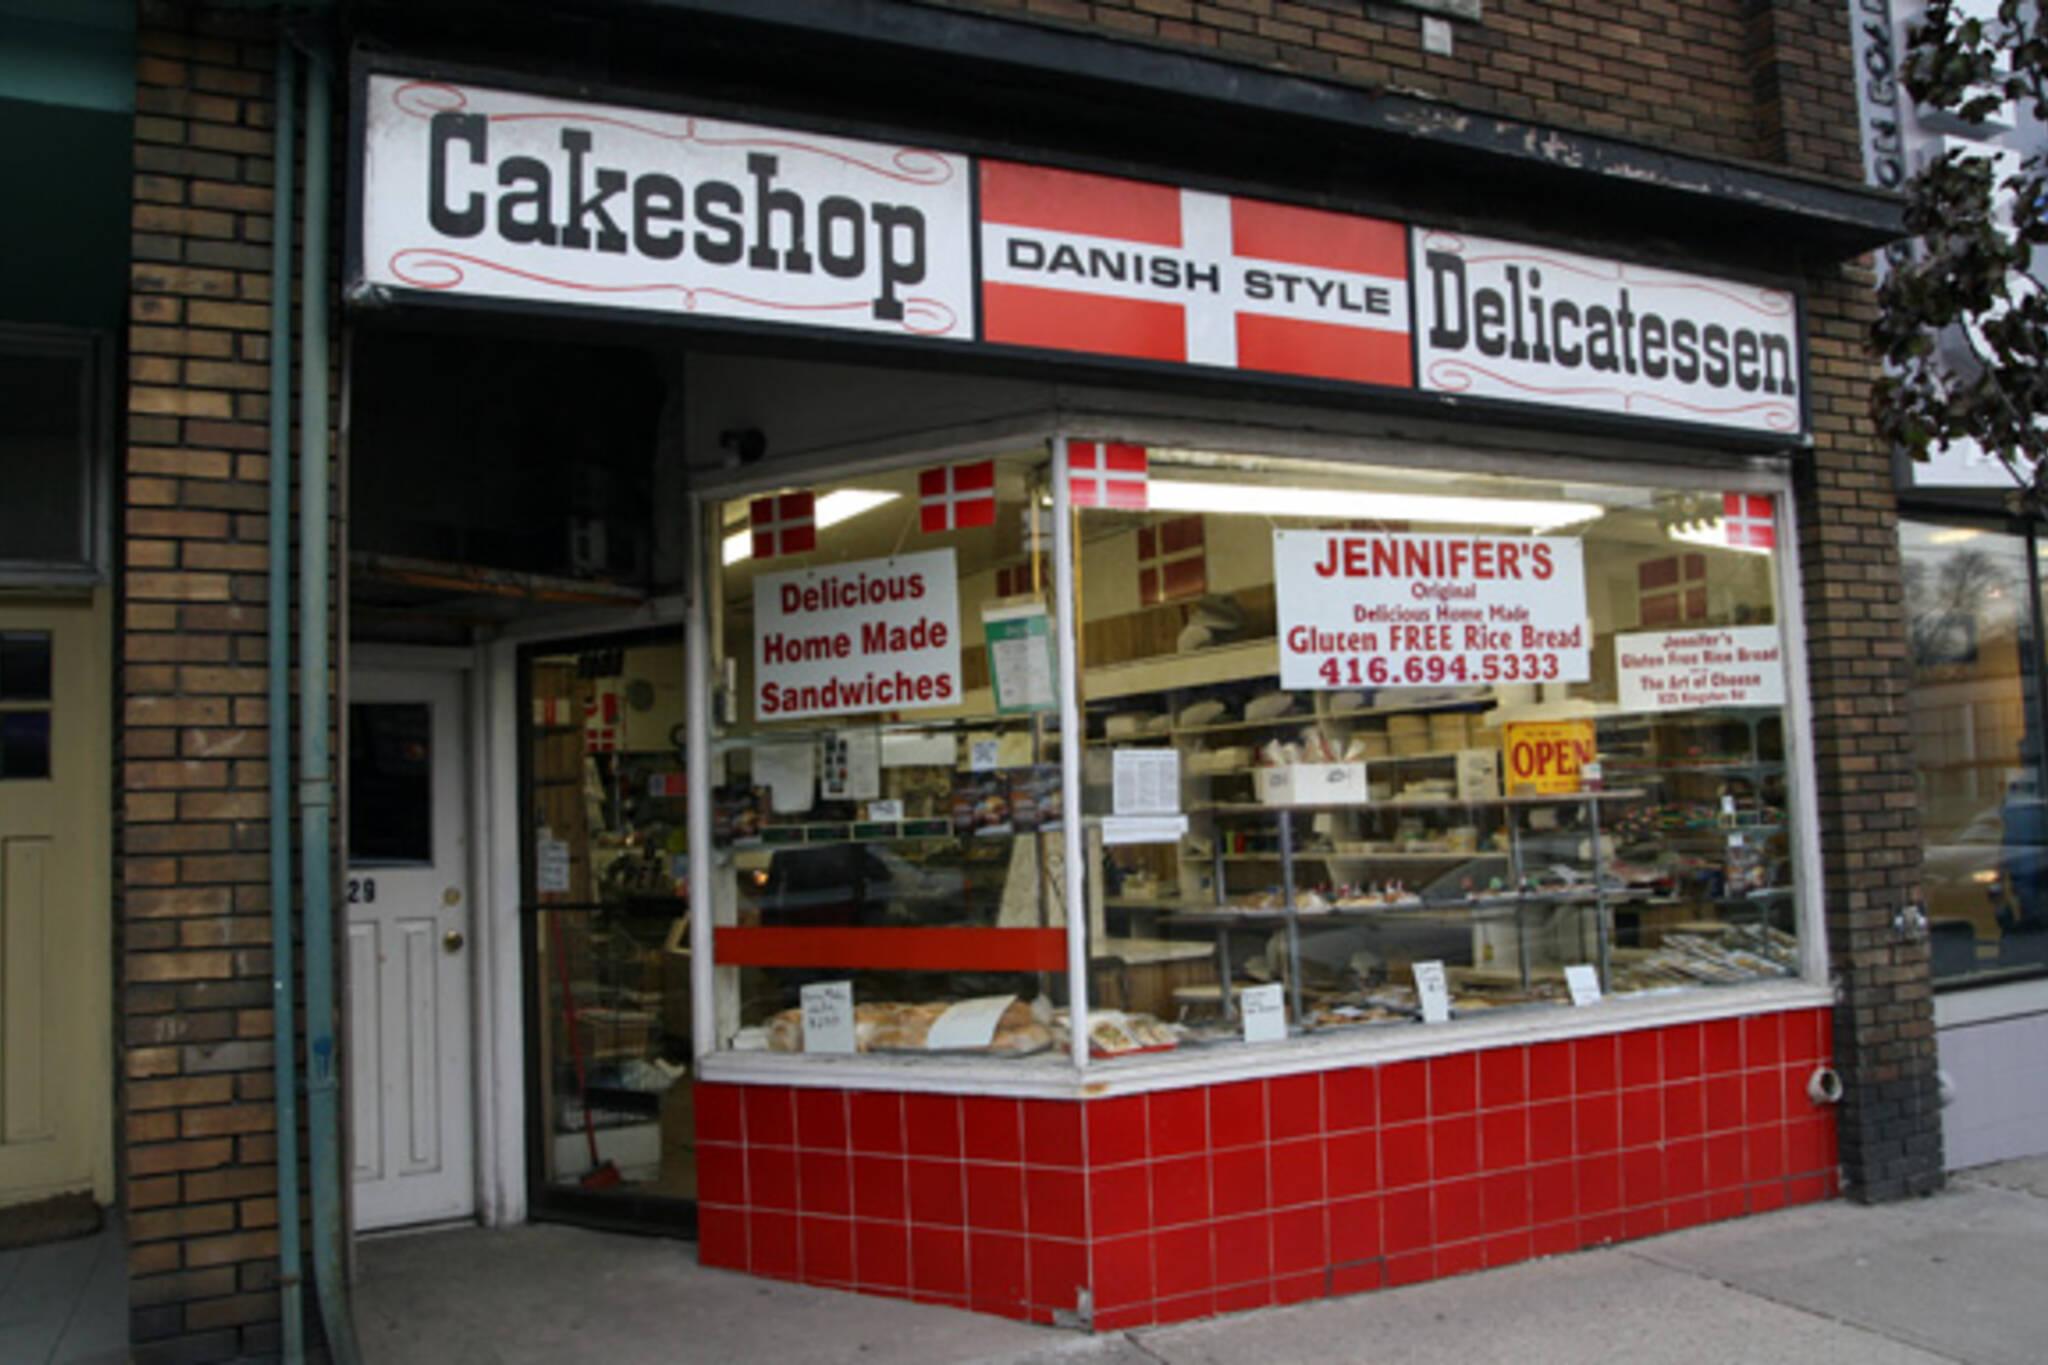 Danish Style Cake Shop & Delicatessen